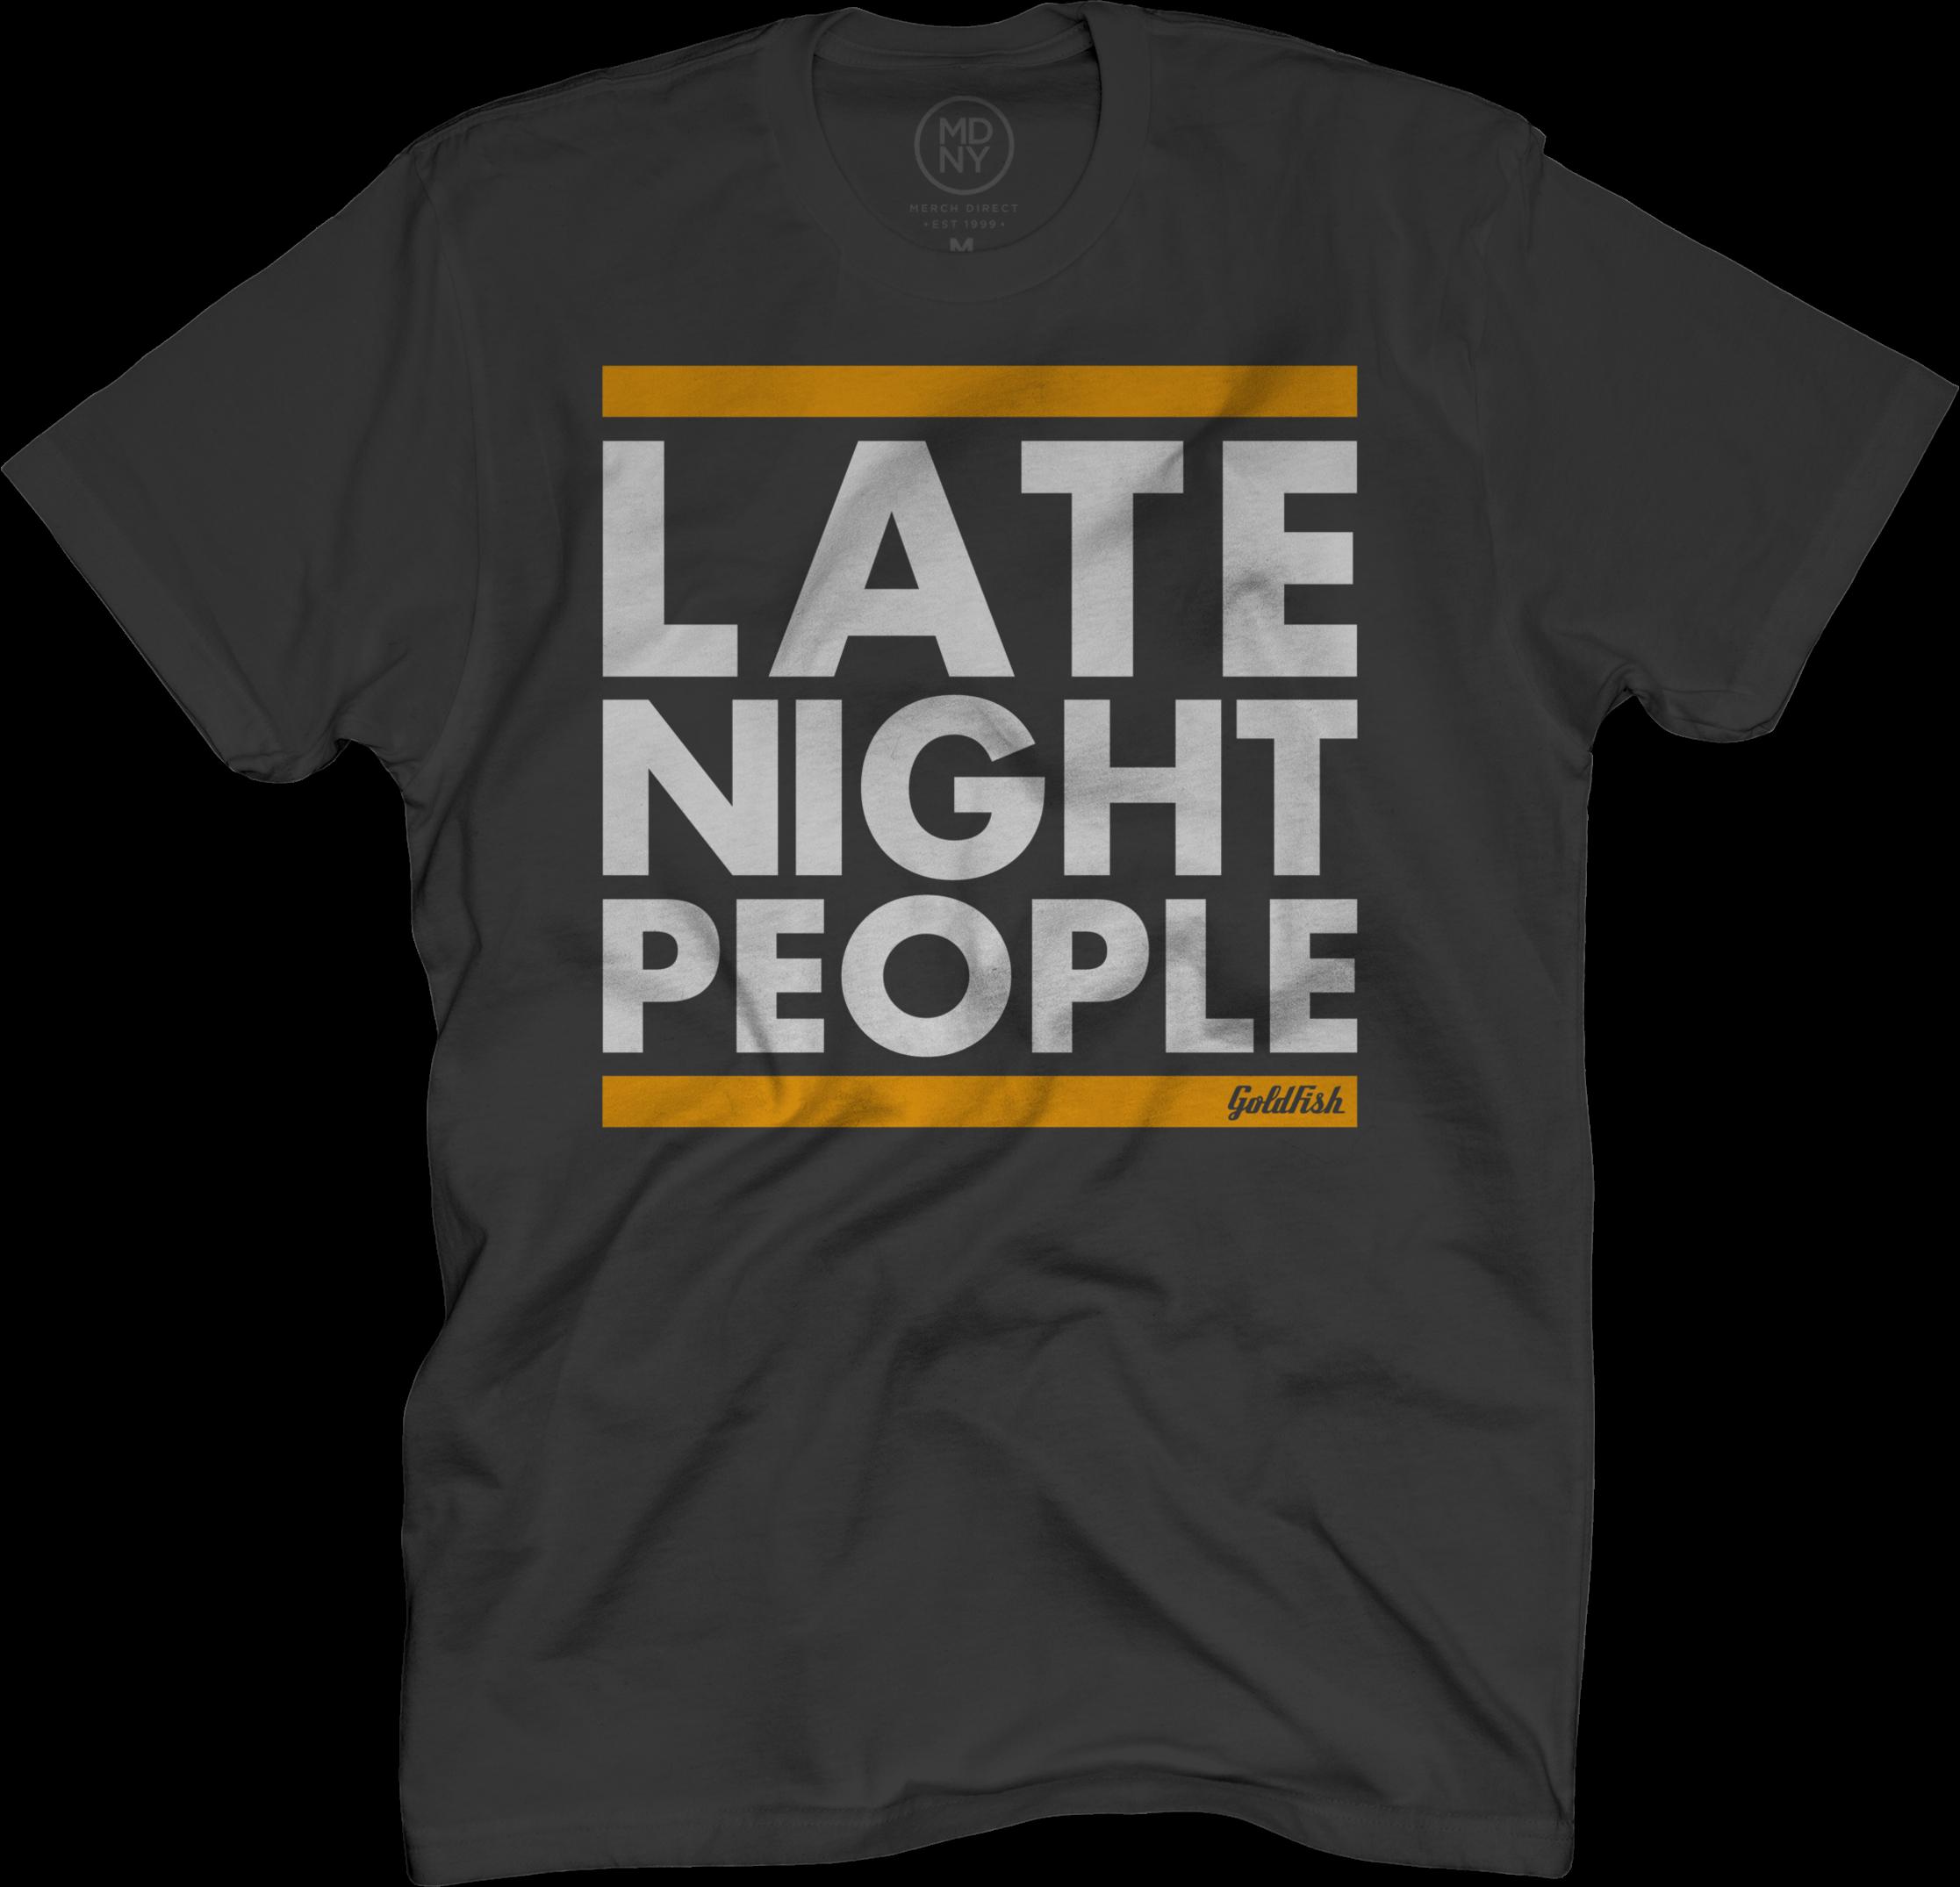 Late Night People Tee